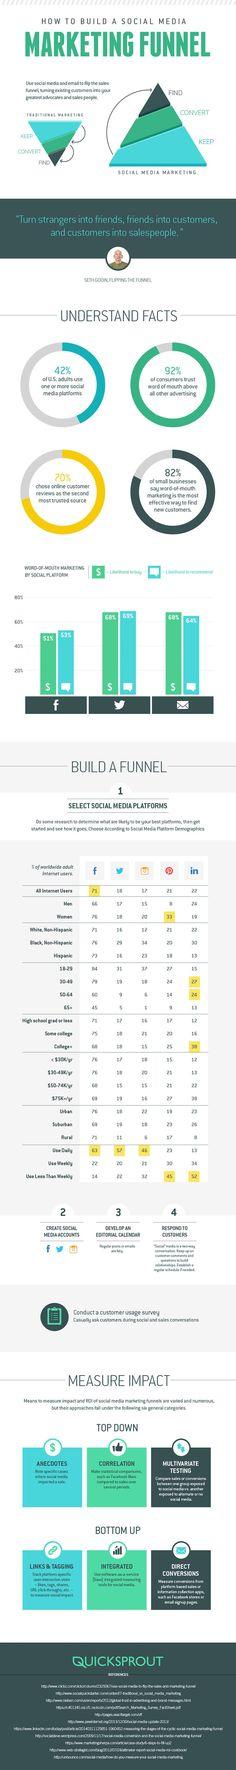 How to build a Social Media Marketing Funnel - #SocialMedia #SocialNetworks #Infographic